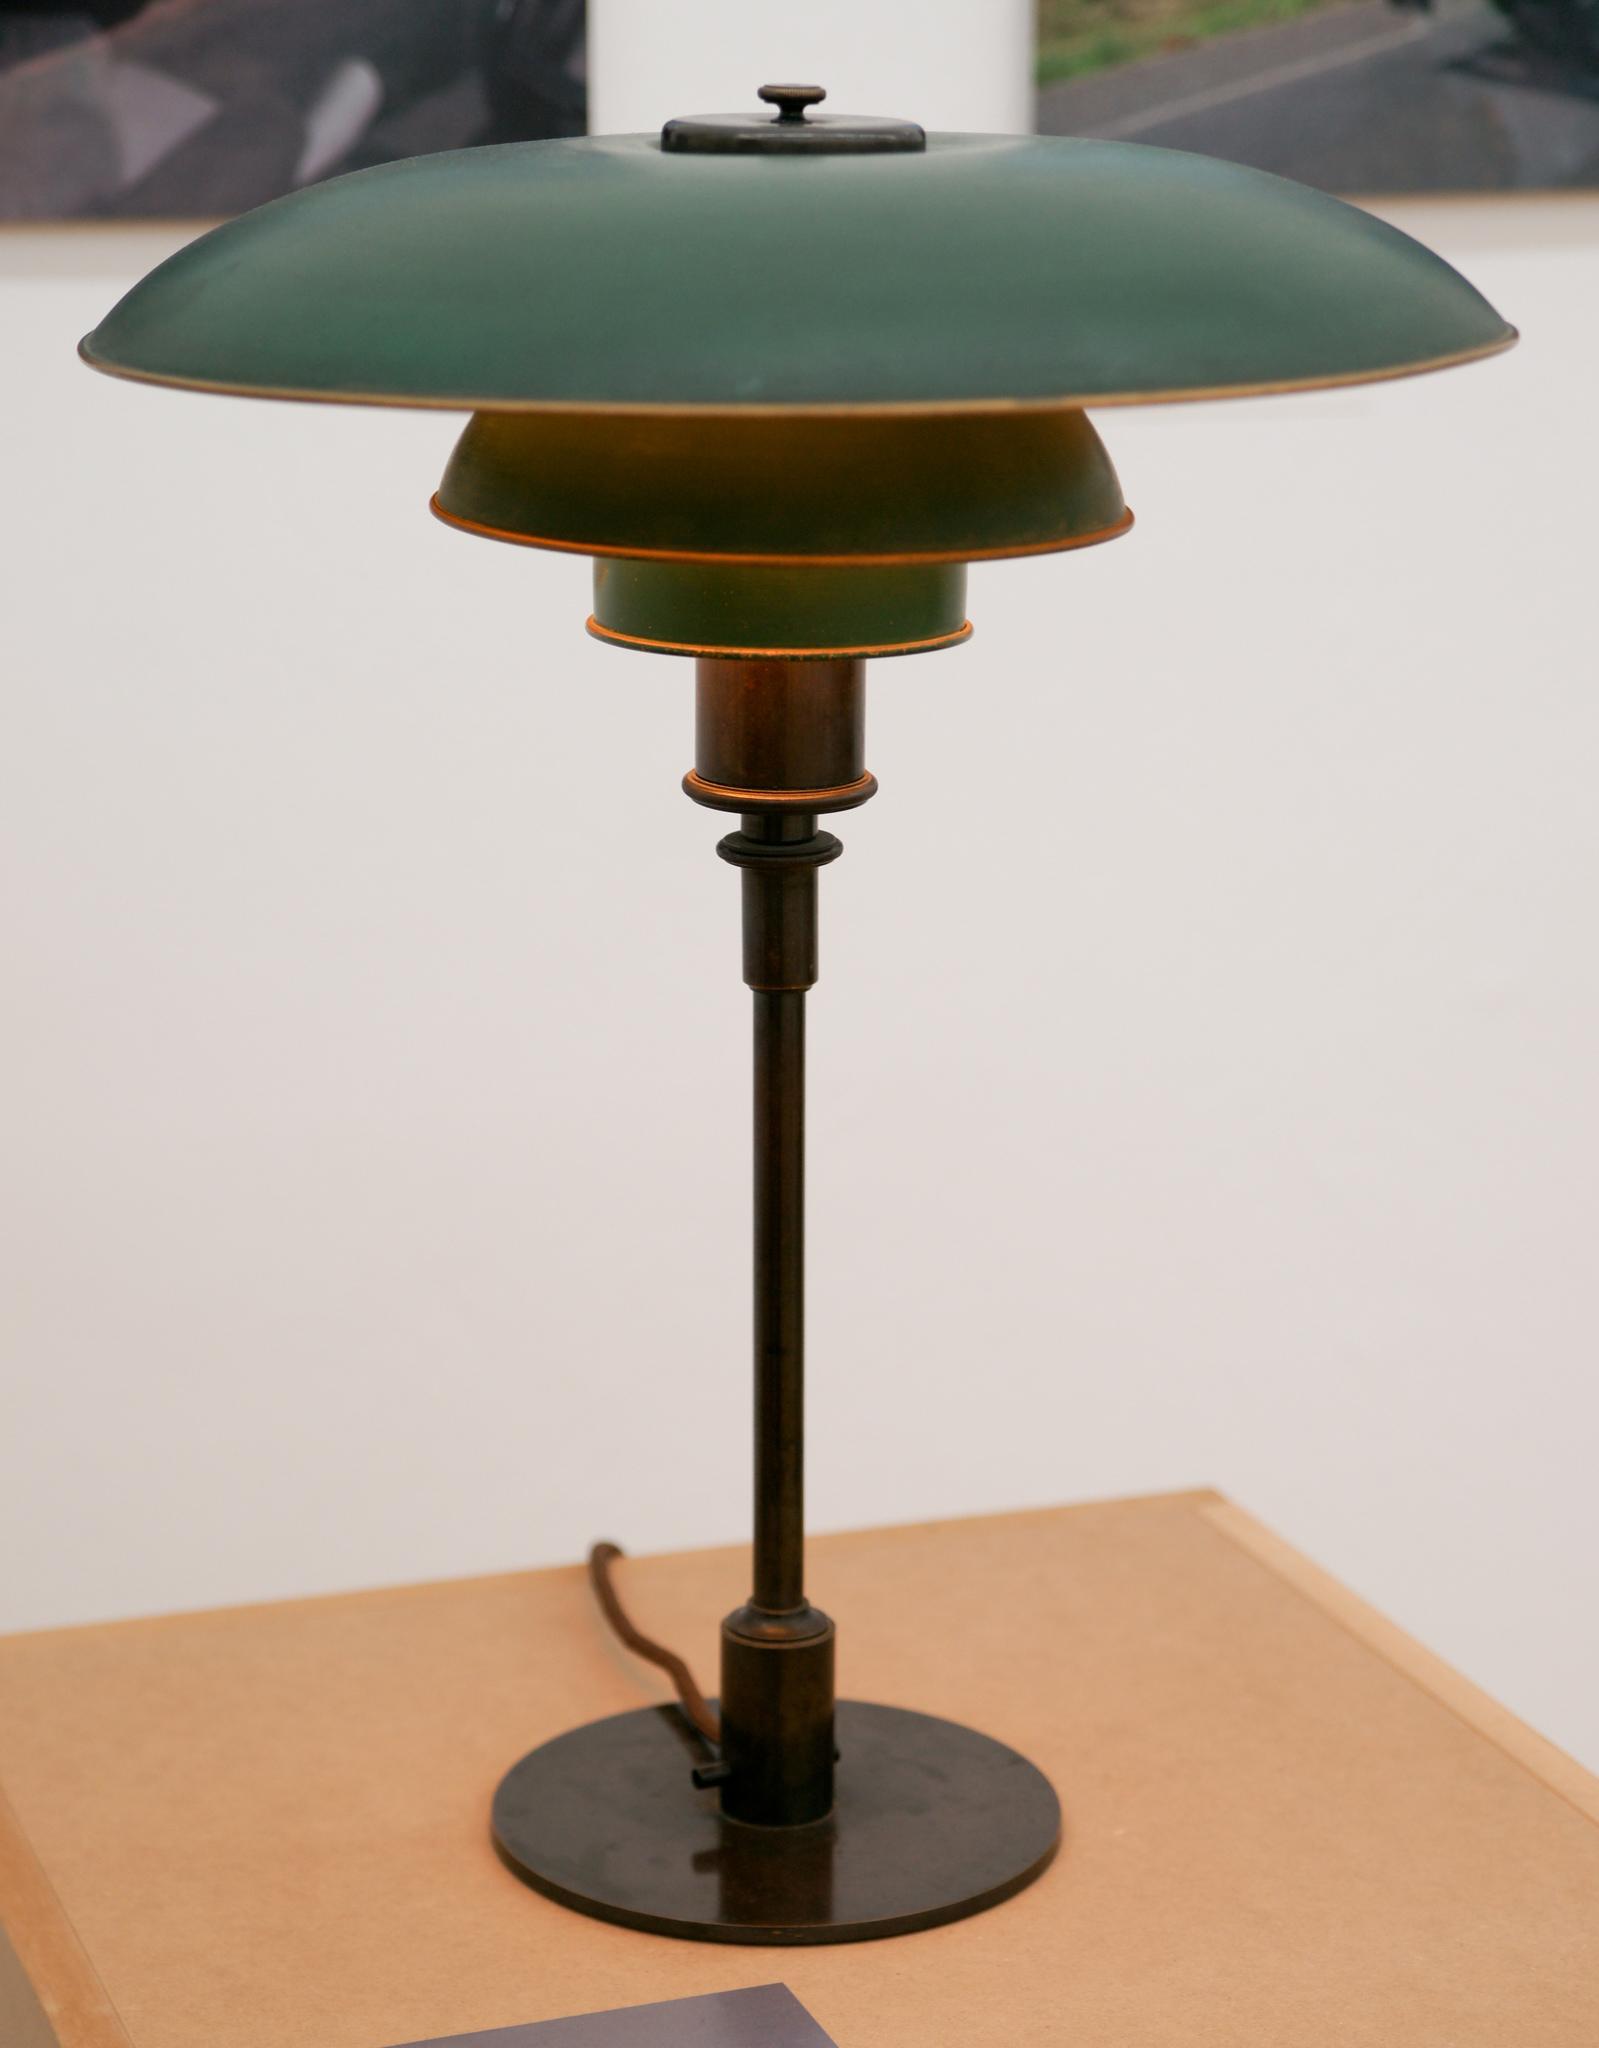 replica Louis Poulsen table lamp by Poul Henningsen